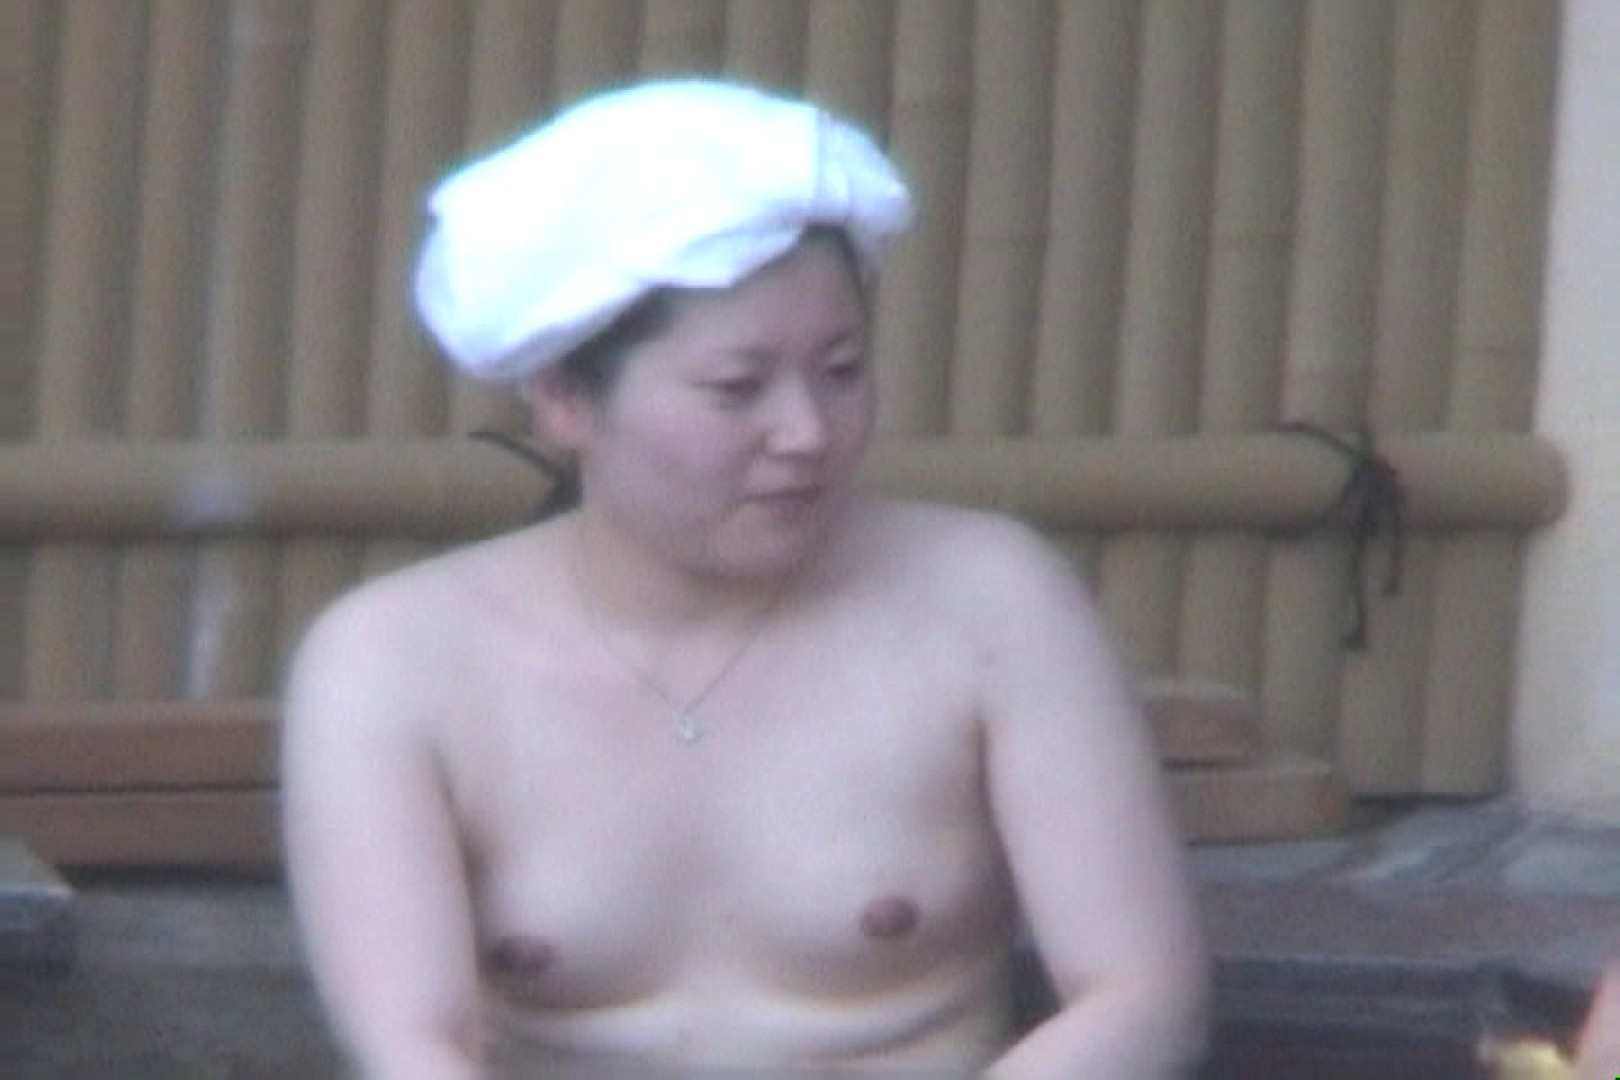 Aquaな露天風呂Vol.86【VIP限定】 OLのエロ生活 オマンコ無修正動画無料 96連発 26